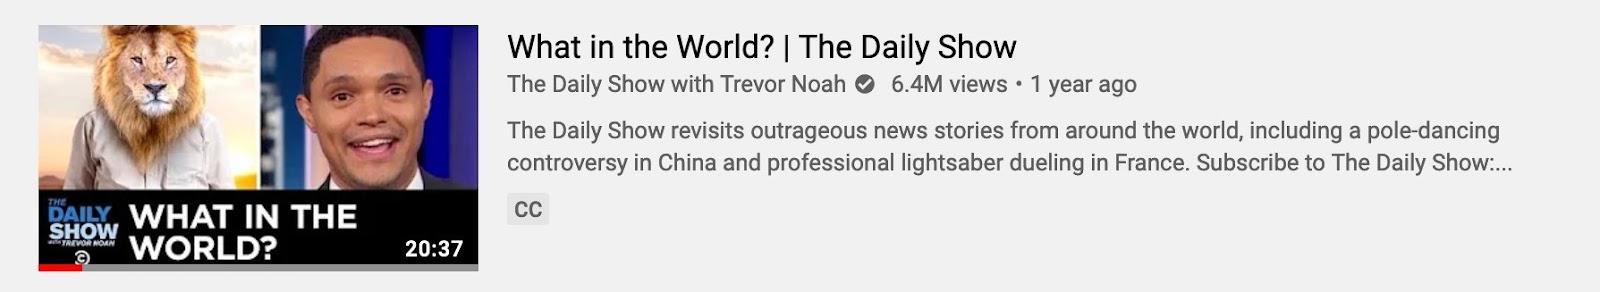 Daily Show thumbnail